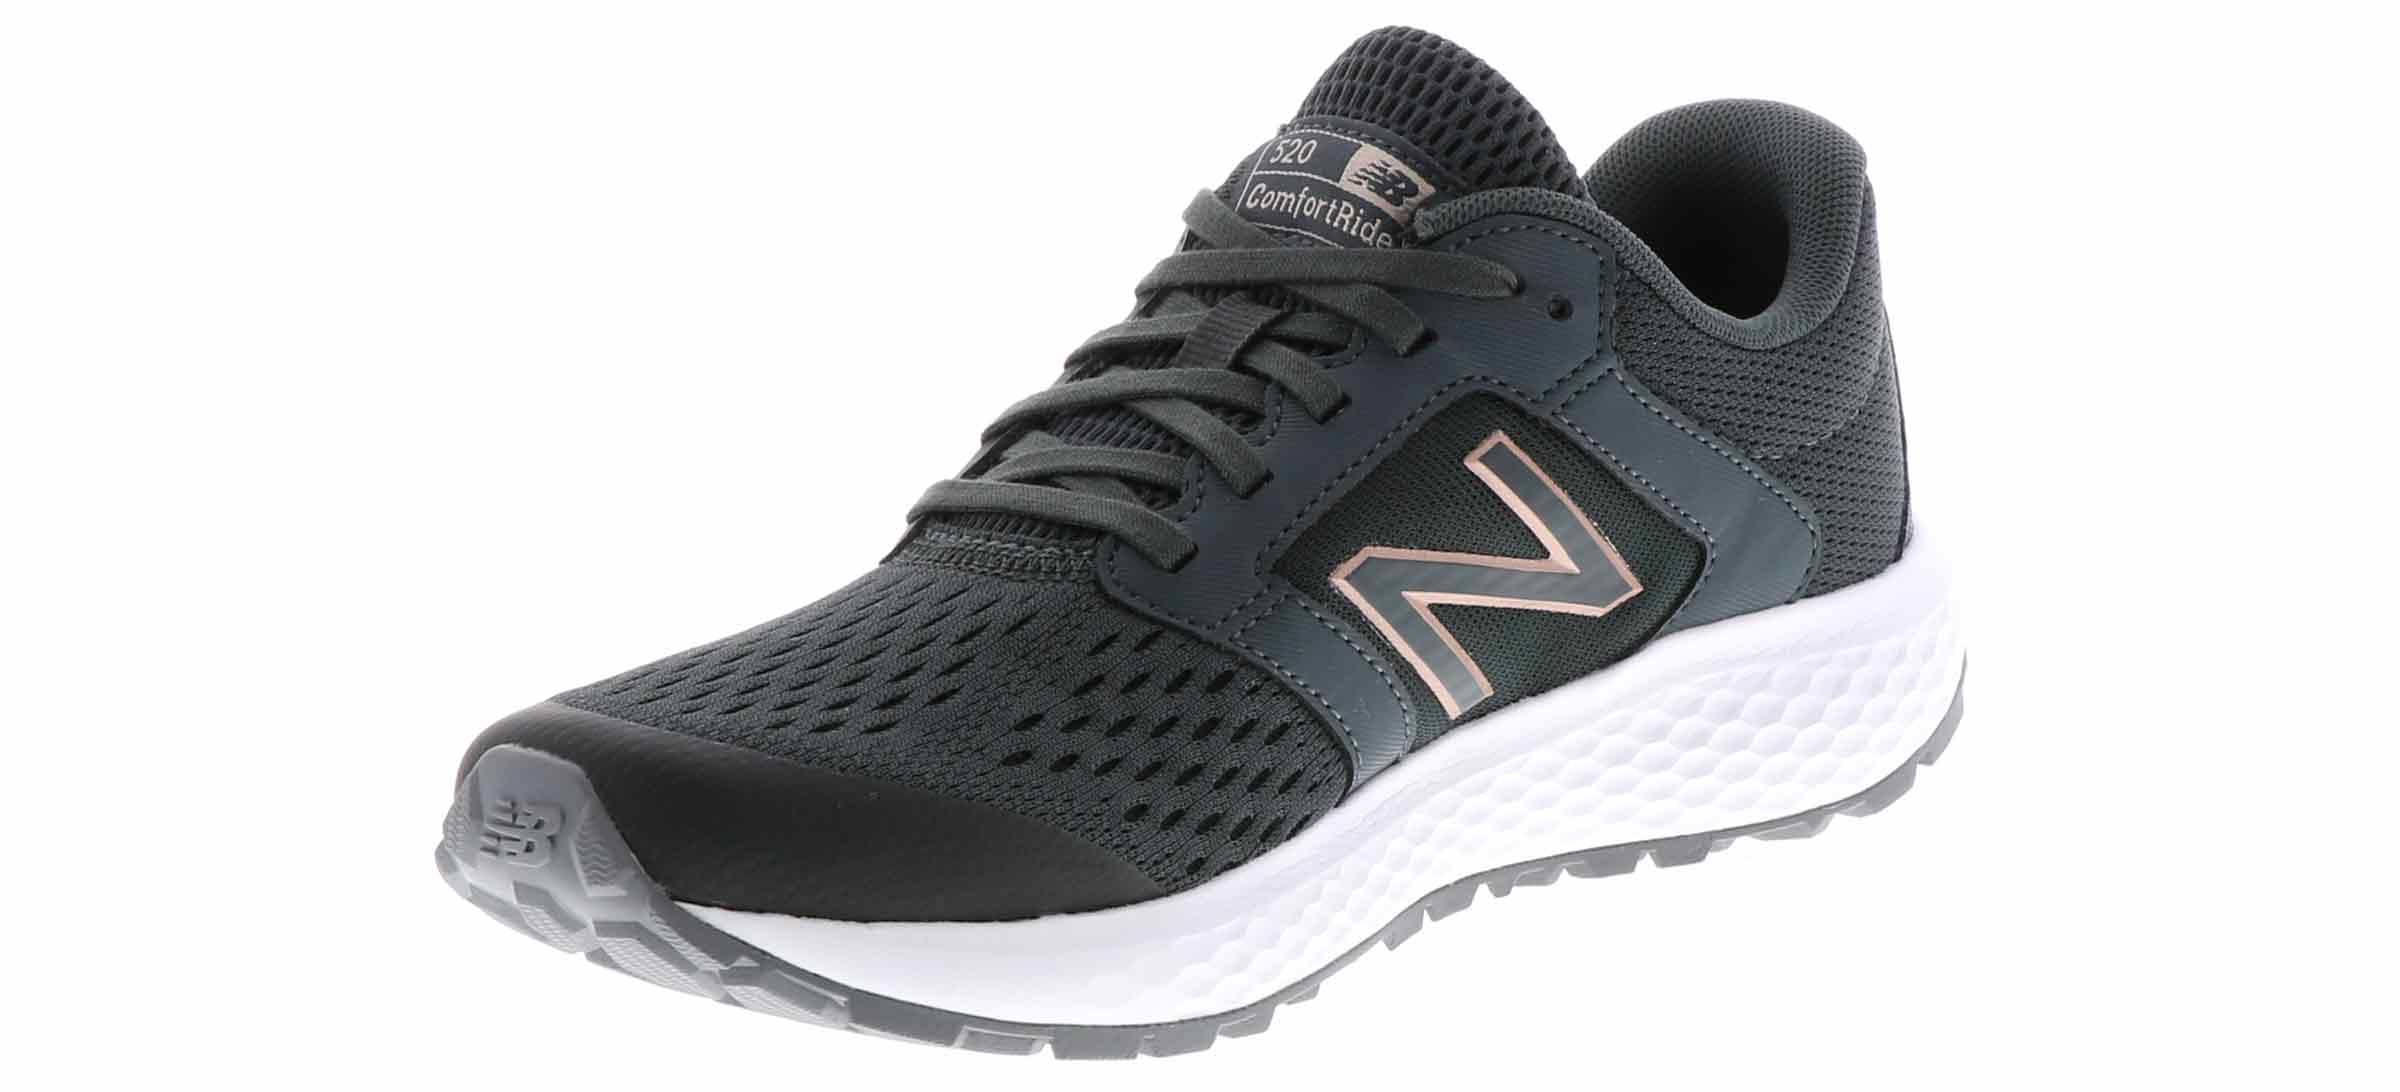 New Balance Comfort Ride 520 V2 ladies running shoes